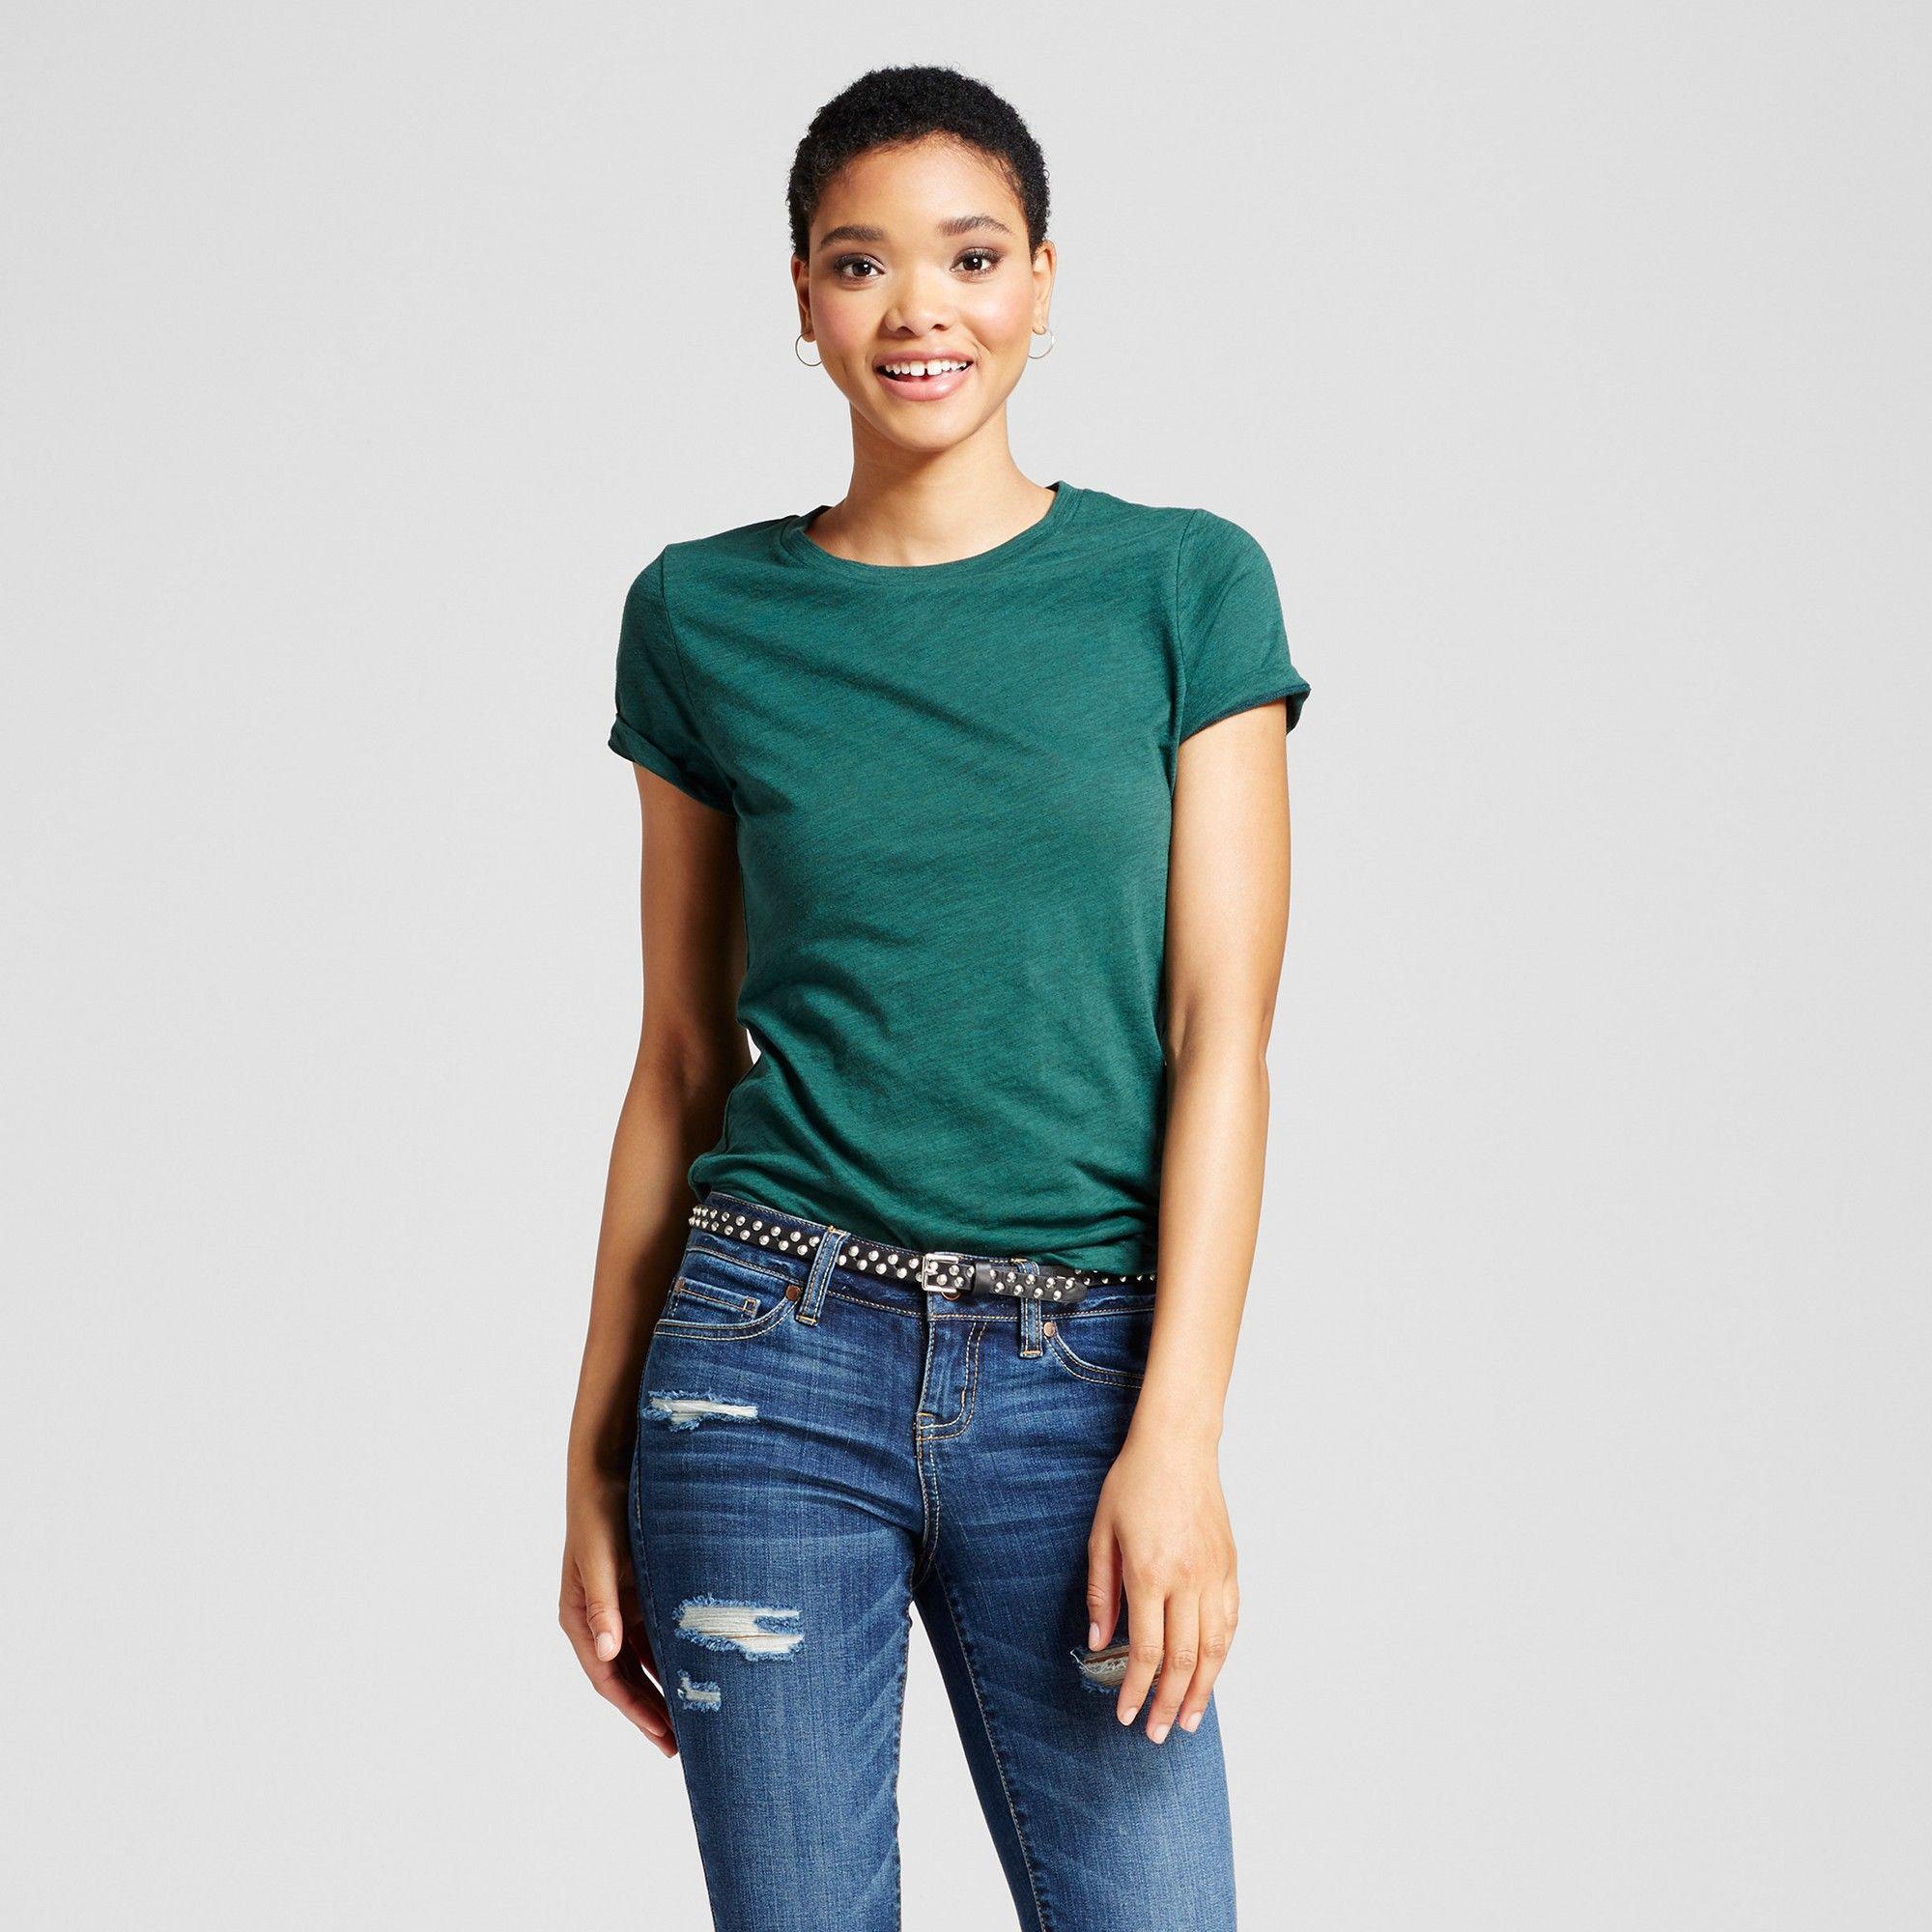 d86b12c1b0119 Target Mossimo T Shirts Womens - BCD Tofu House